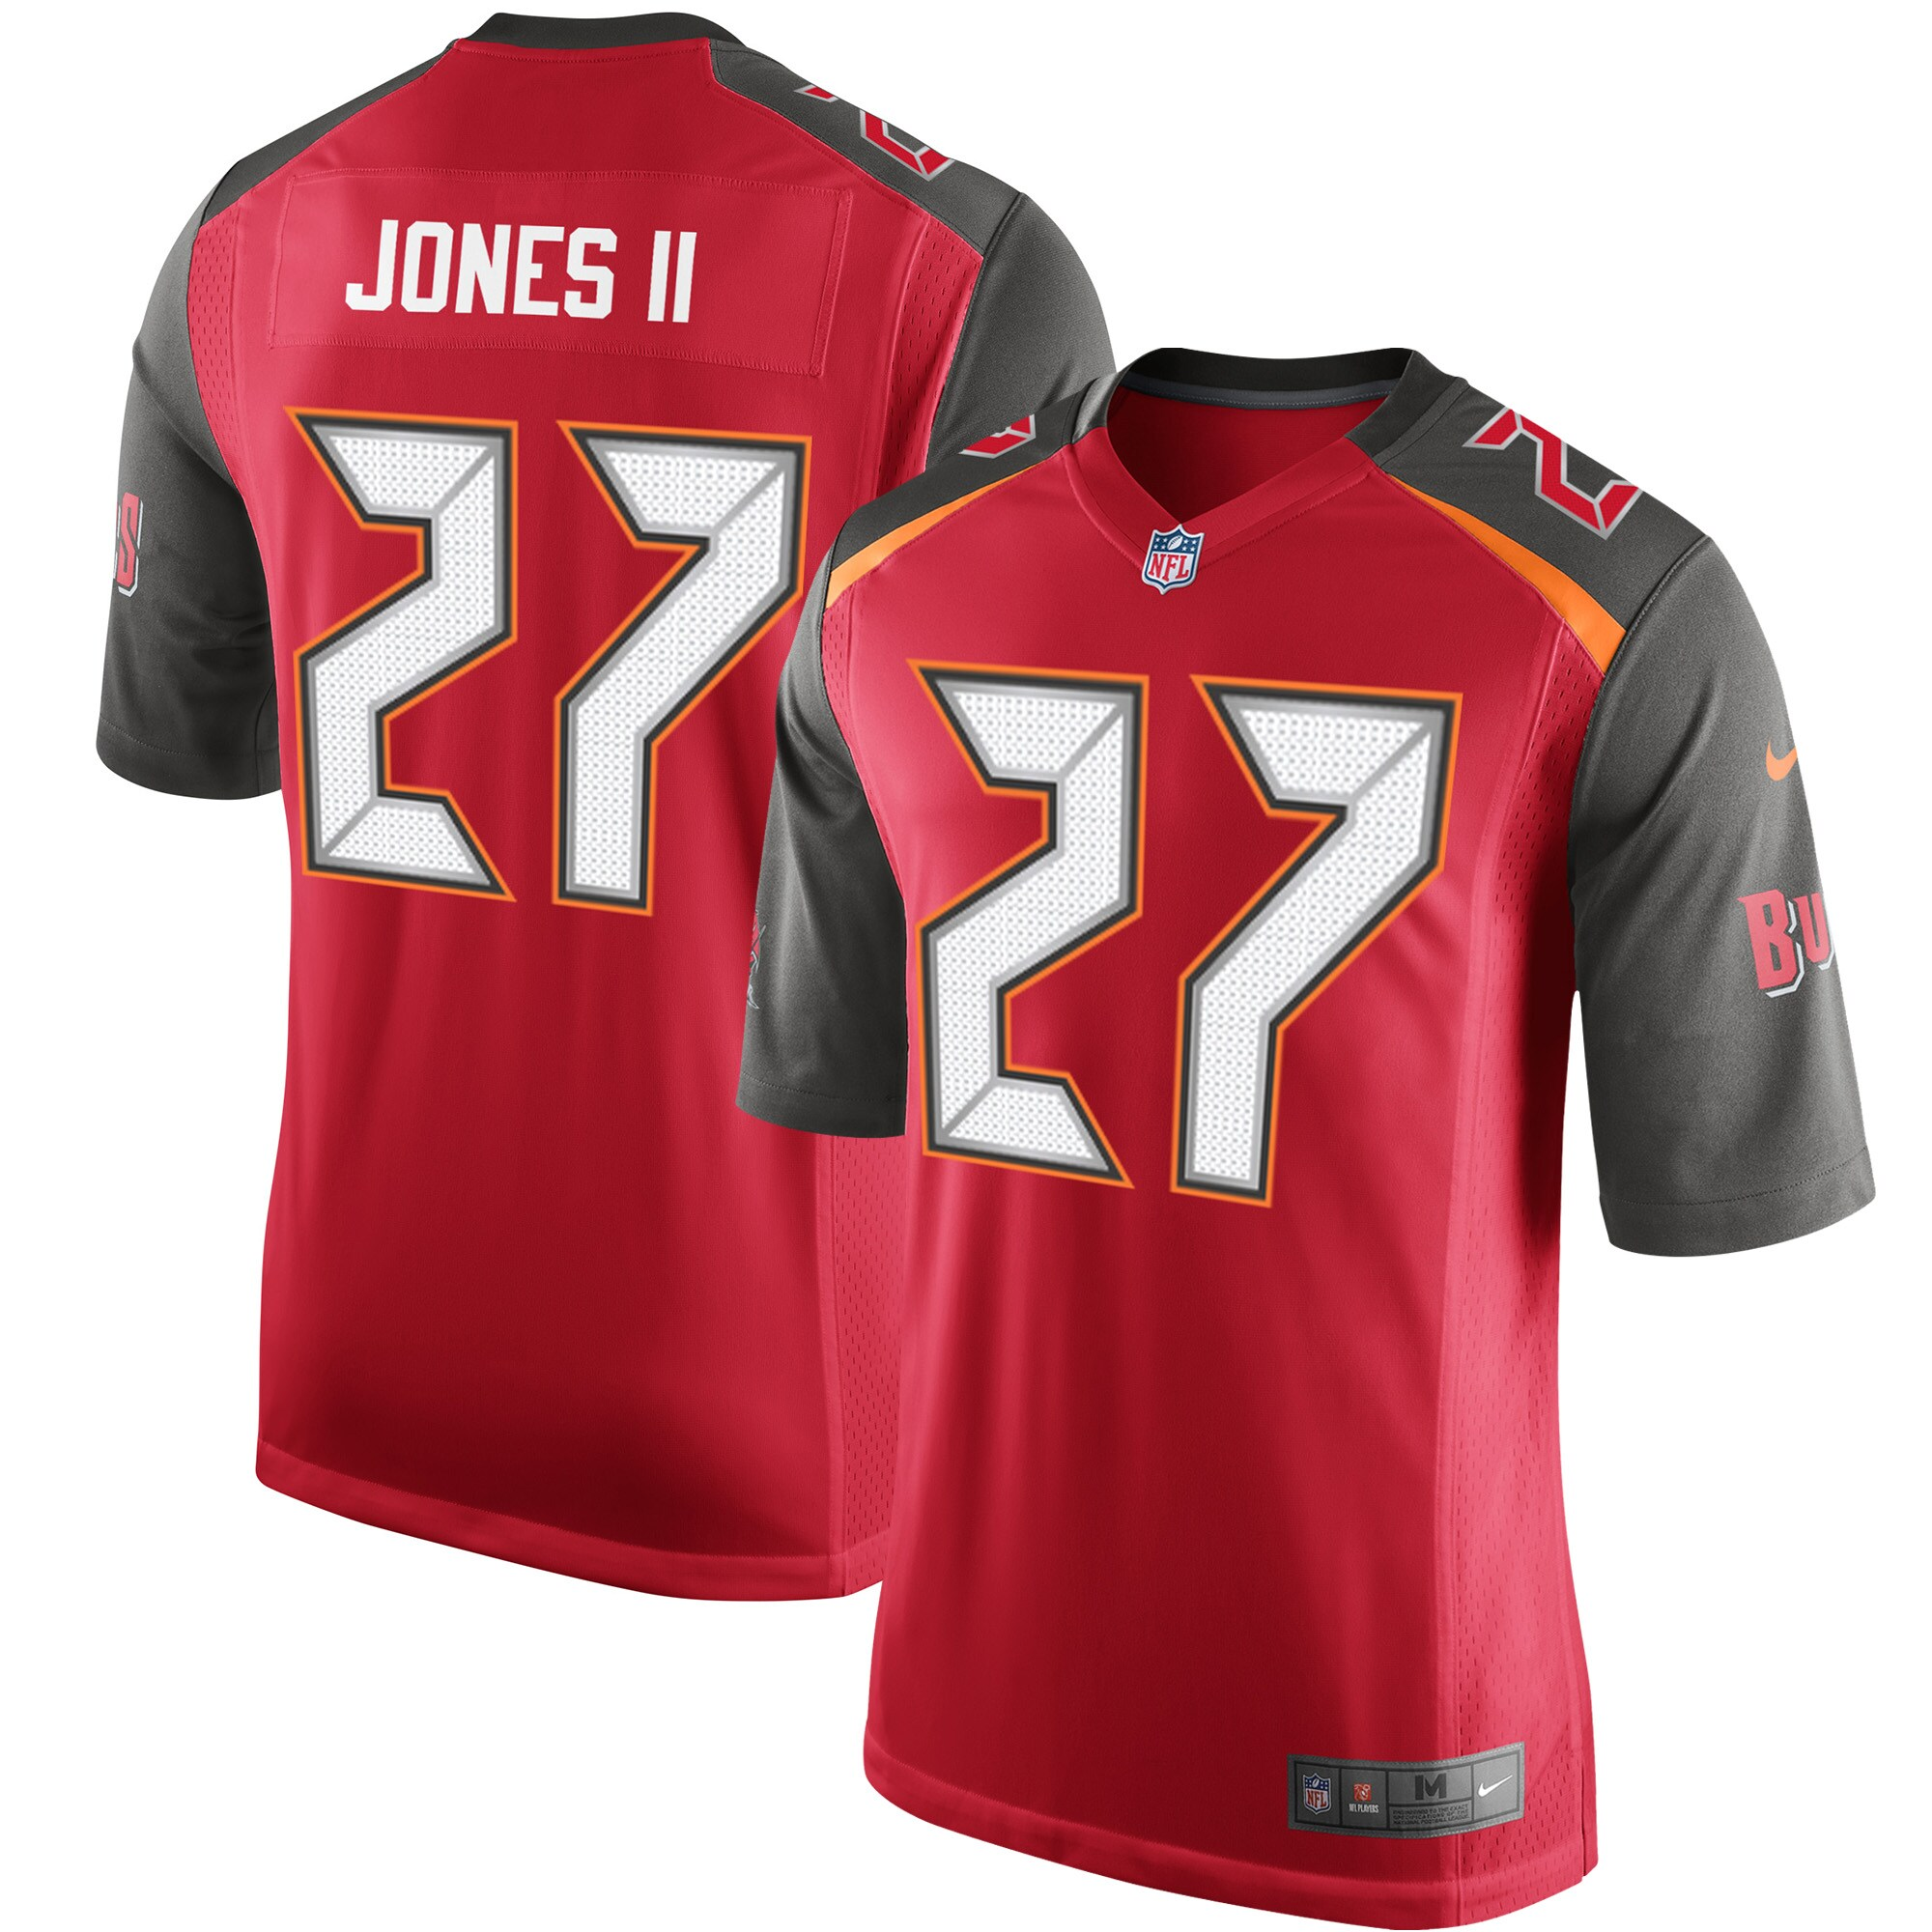 Ronald Jones II Tampa Bay Buccaneers Nike Game Player Jersey - Red